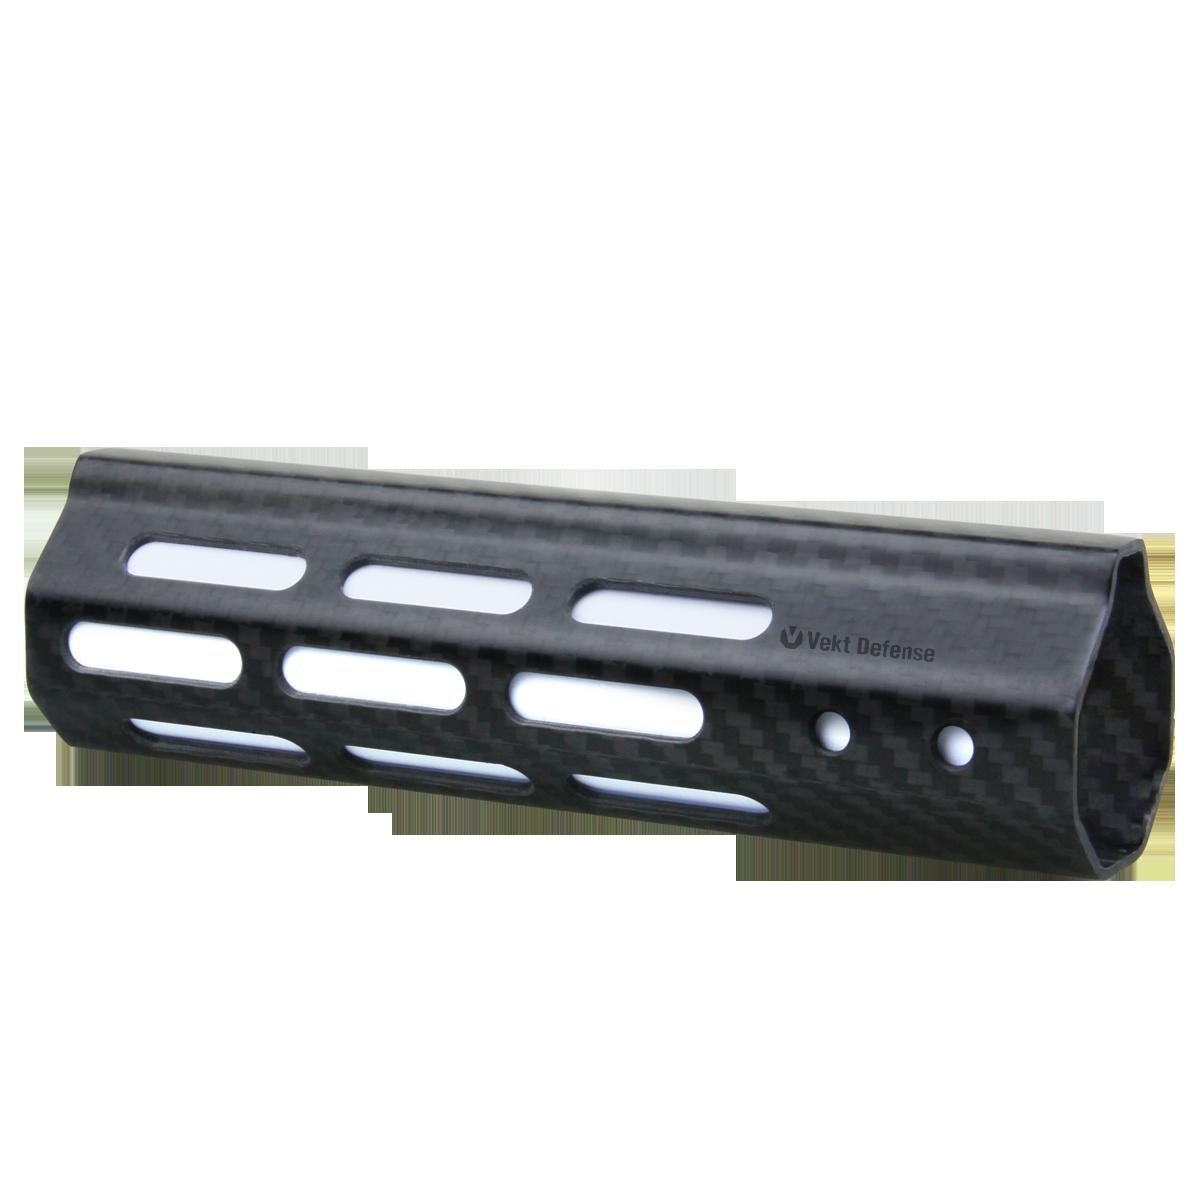 "Vector Optics Vekt Defense VDCF-07 Carbon Fiber 7"" Slim Handguard Rail Mount"